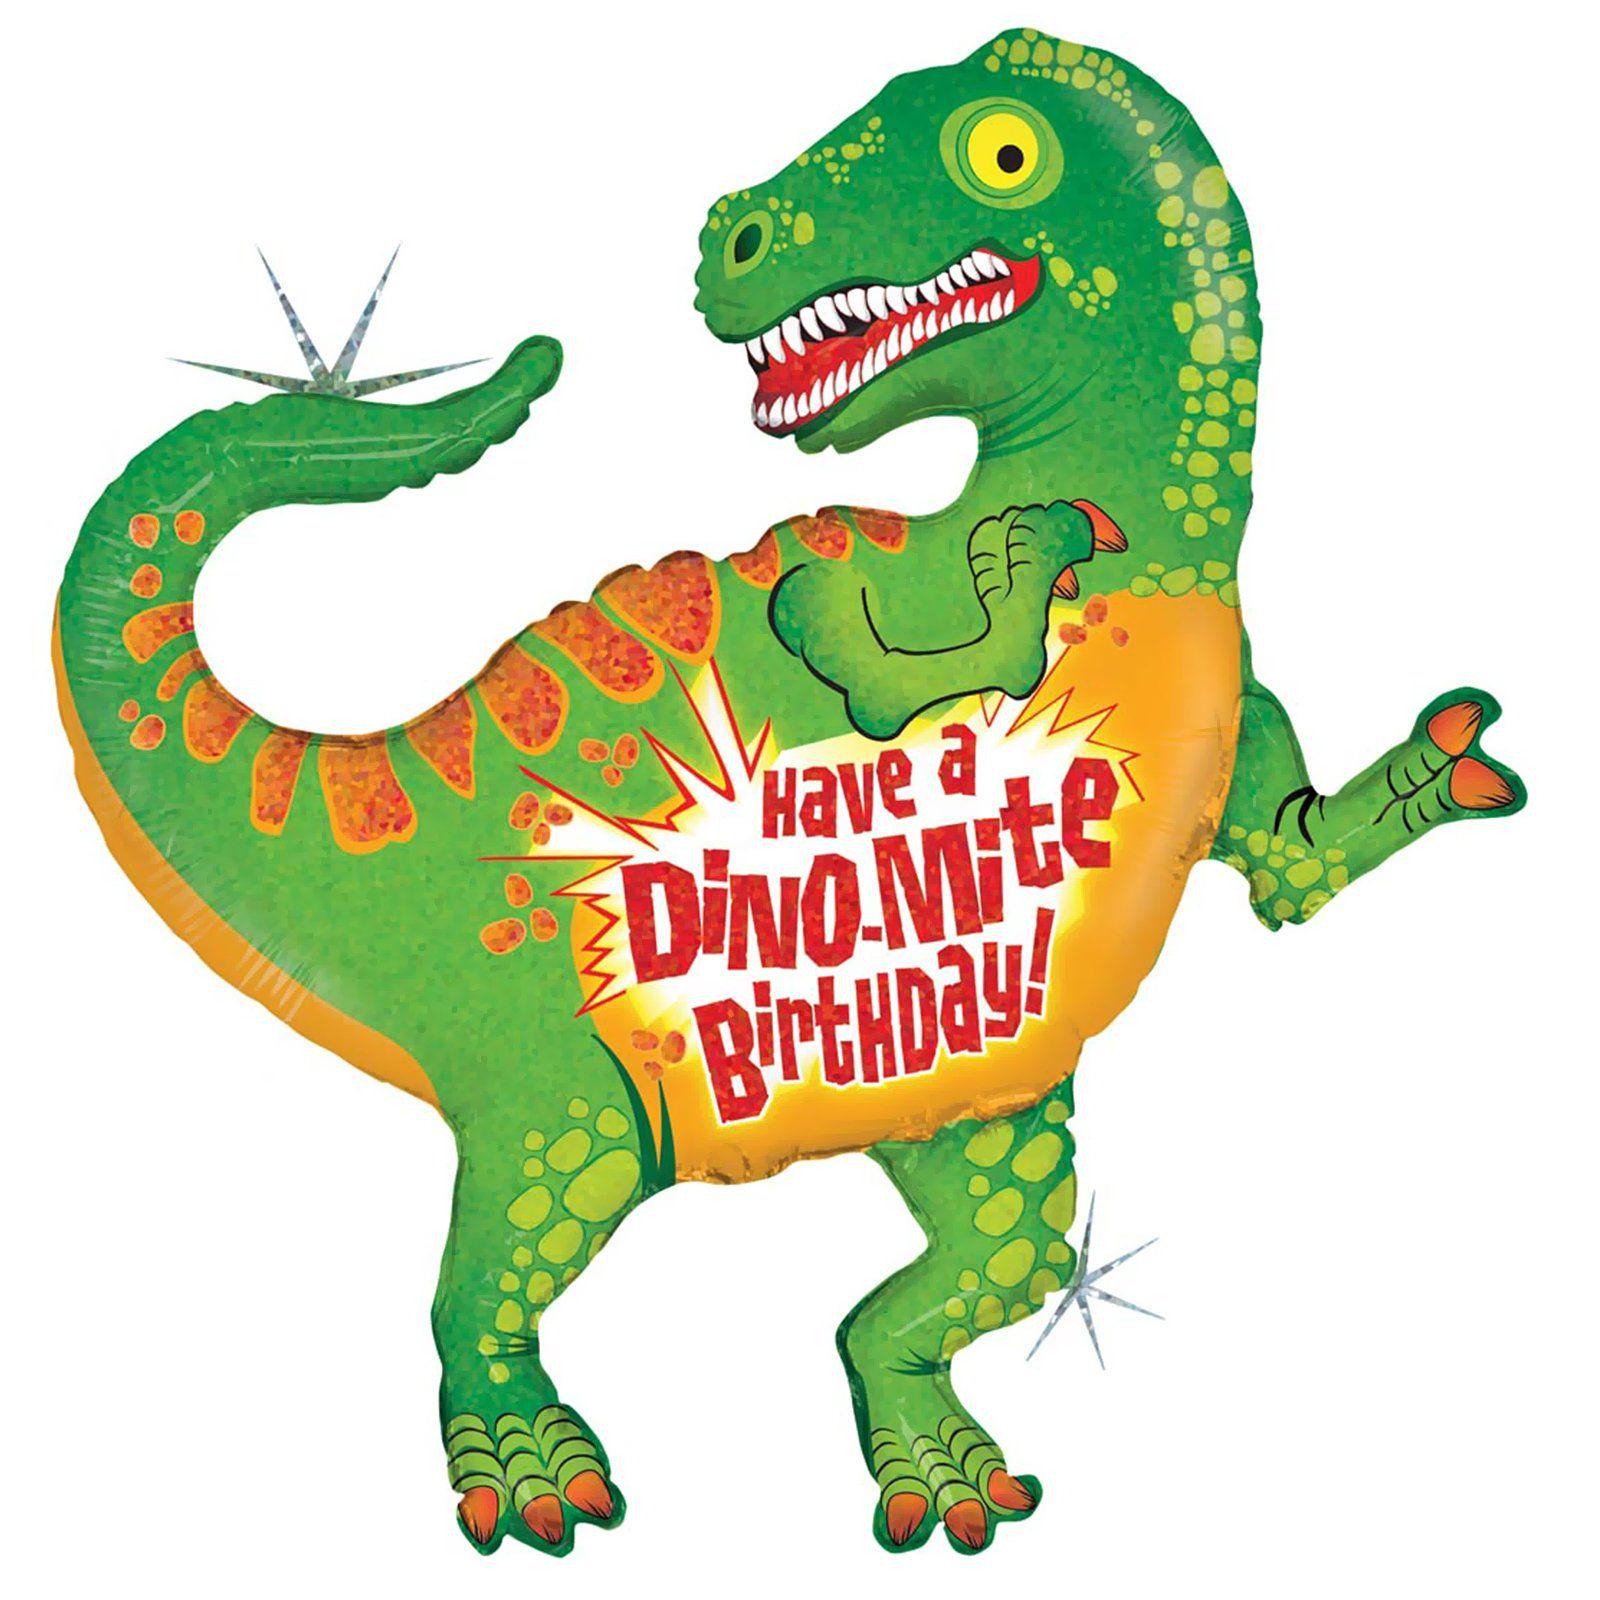 birthday dinosaur Pin by Amra on Max's bday   Pinterest   Birthday, Dinosaur  birthday dinosaur